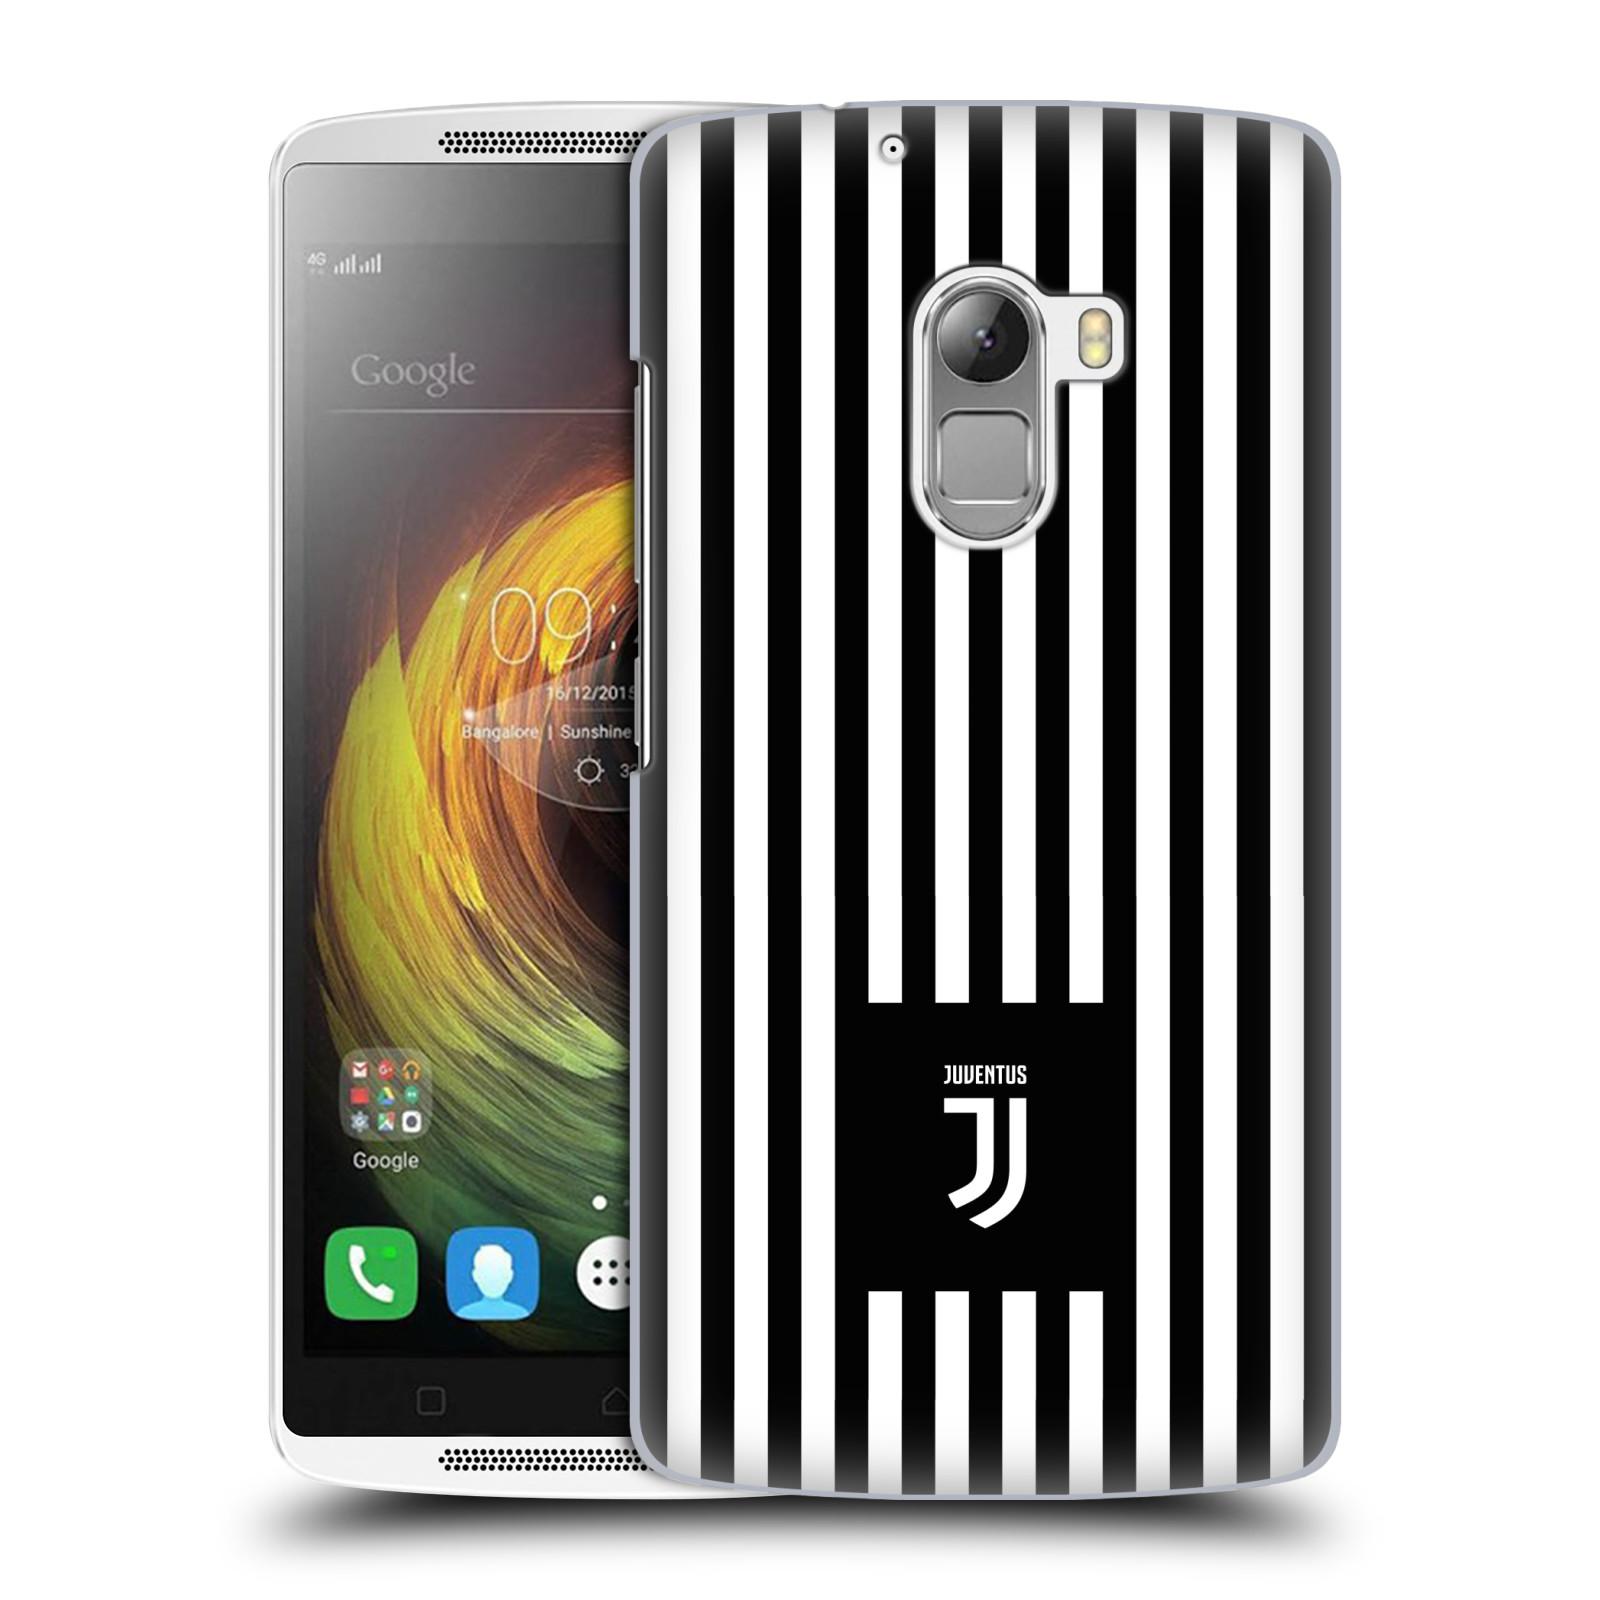 Plastové pouzdro na mobil Lenovo A7010 - Head Case - Juventus FC - Nové logo - Pruhy